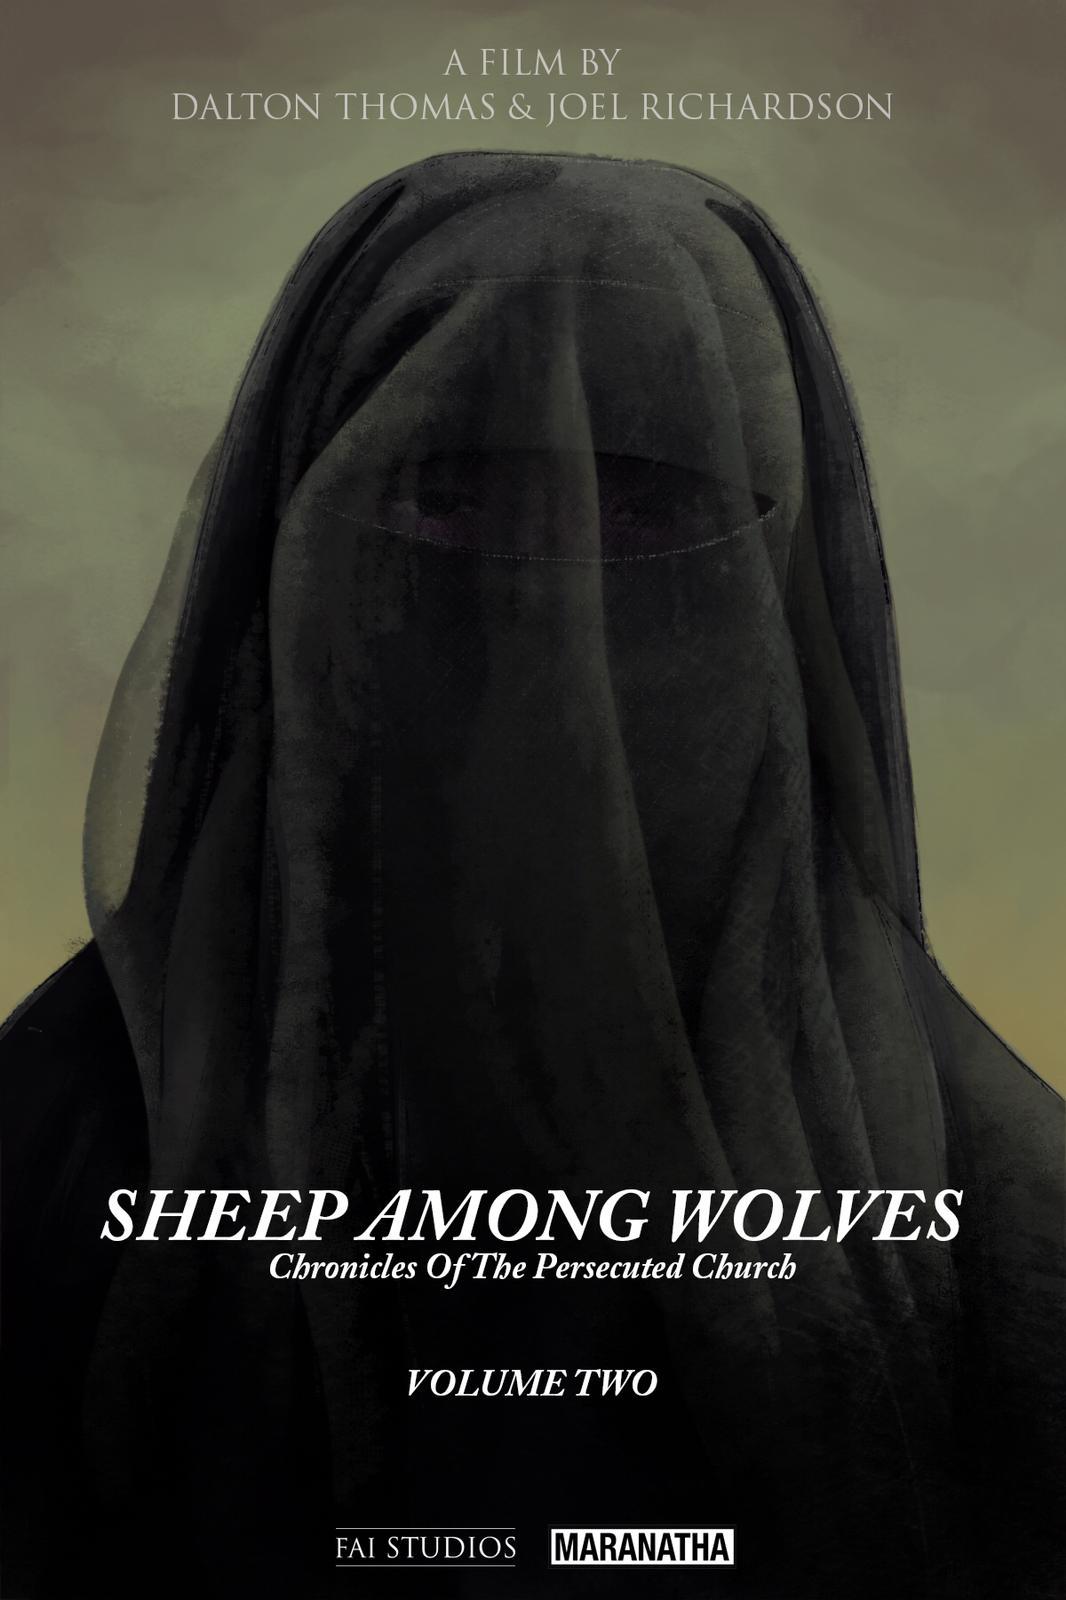 Sheep II Theatrical Poster Hi Res.JPG